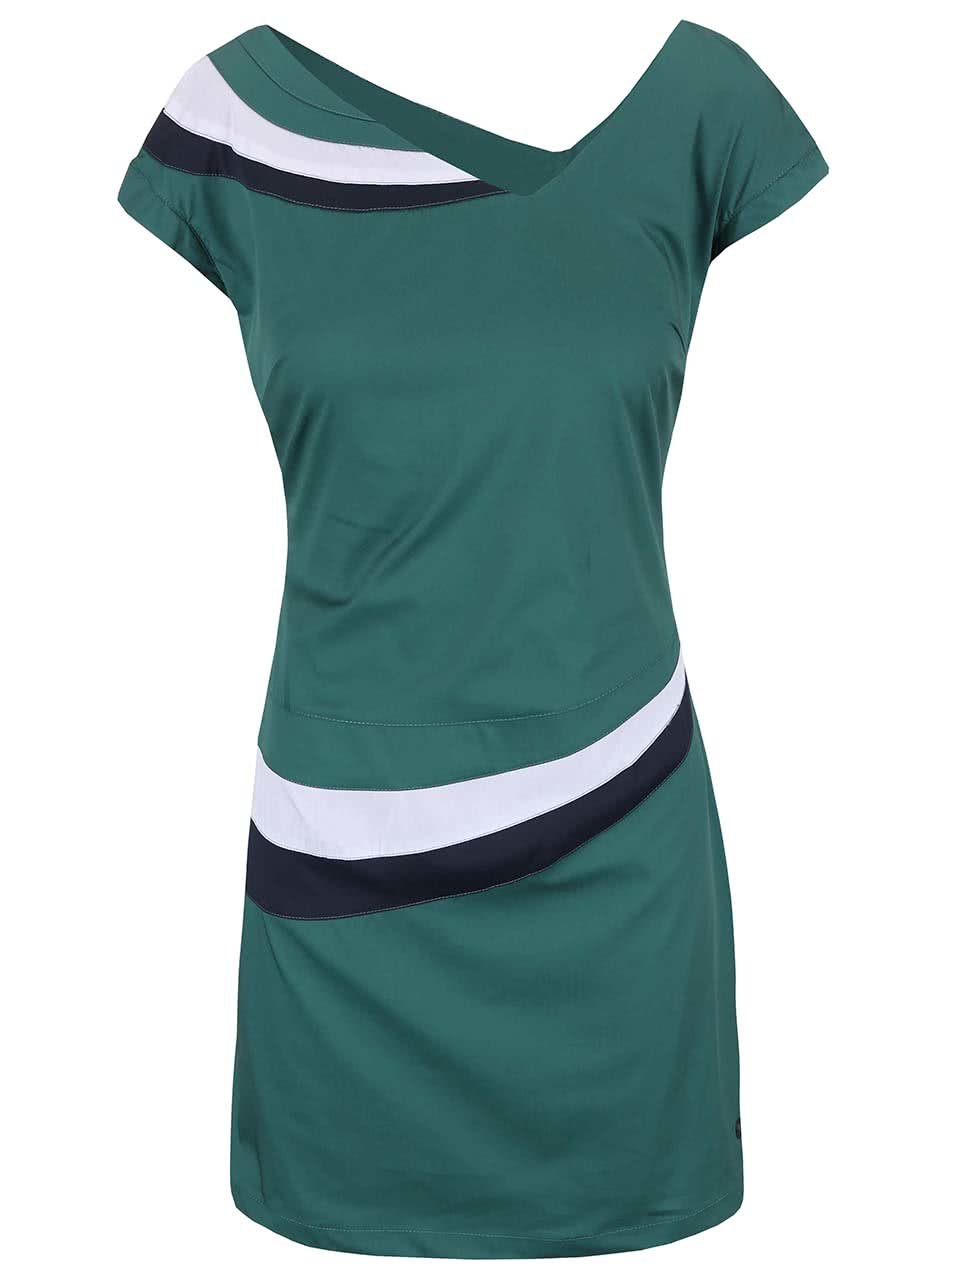 Tmavě zelené šaty Skunkfunk Gaiarre